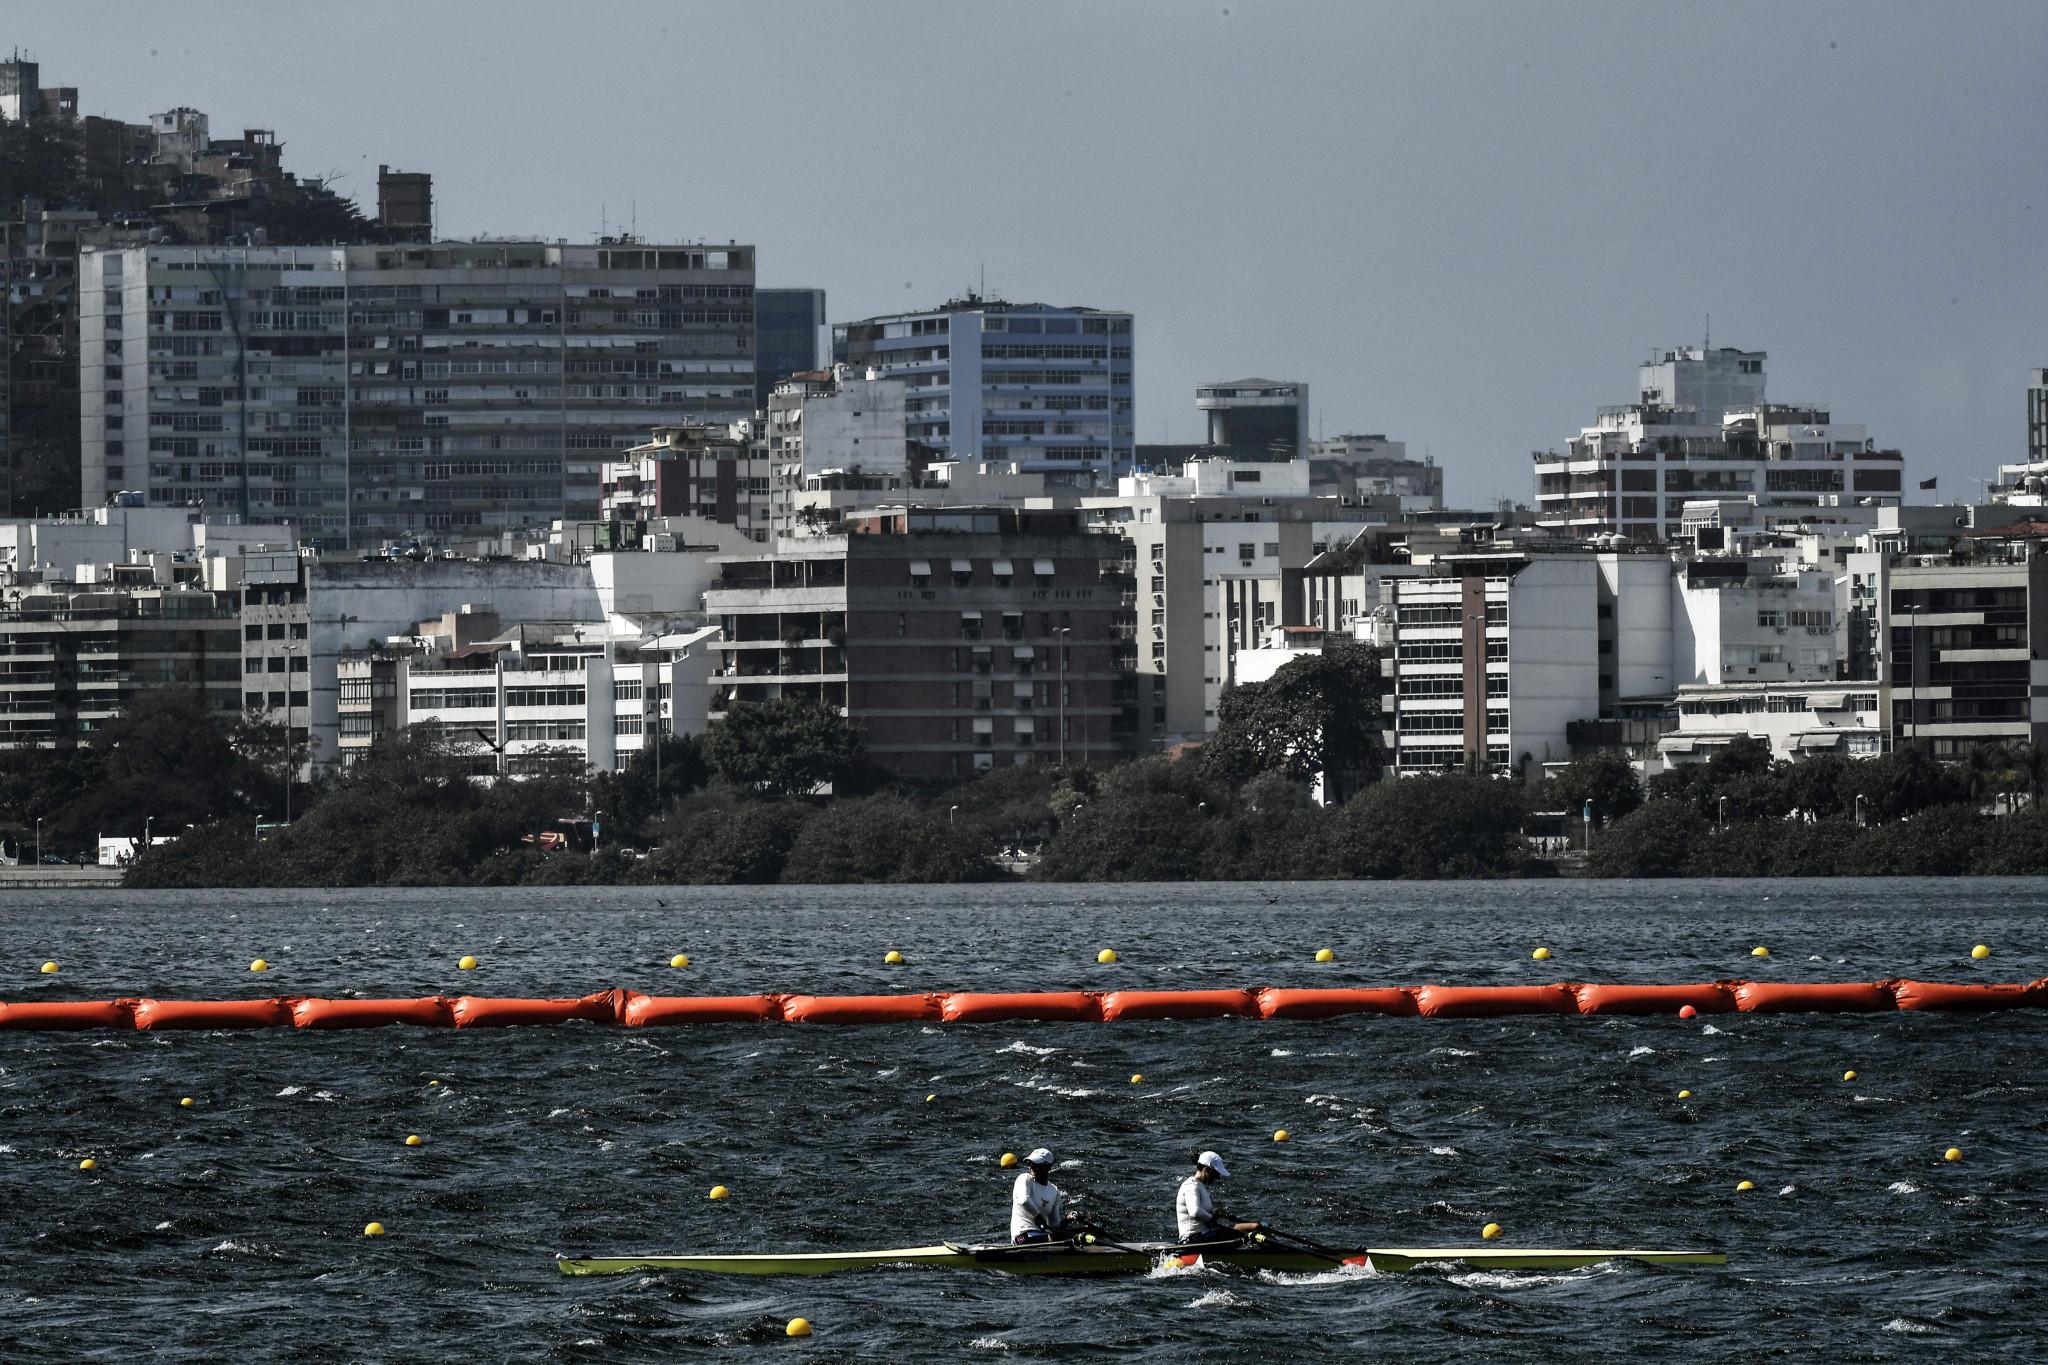 Qualifiers took place at the Rodrigo de Freitas Lagoon in Rio de Janeiro ©Getty Images